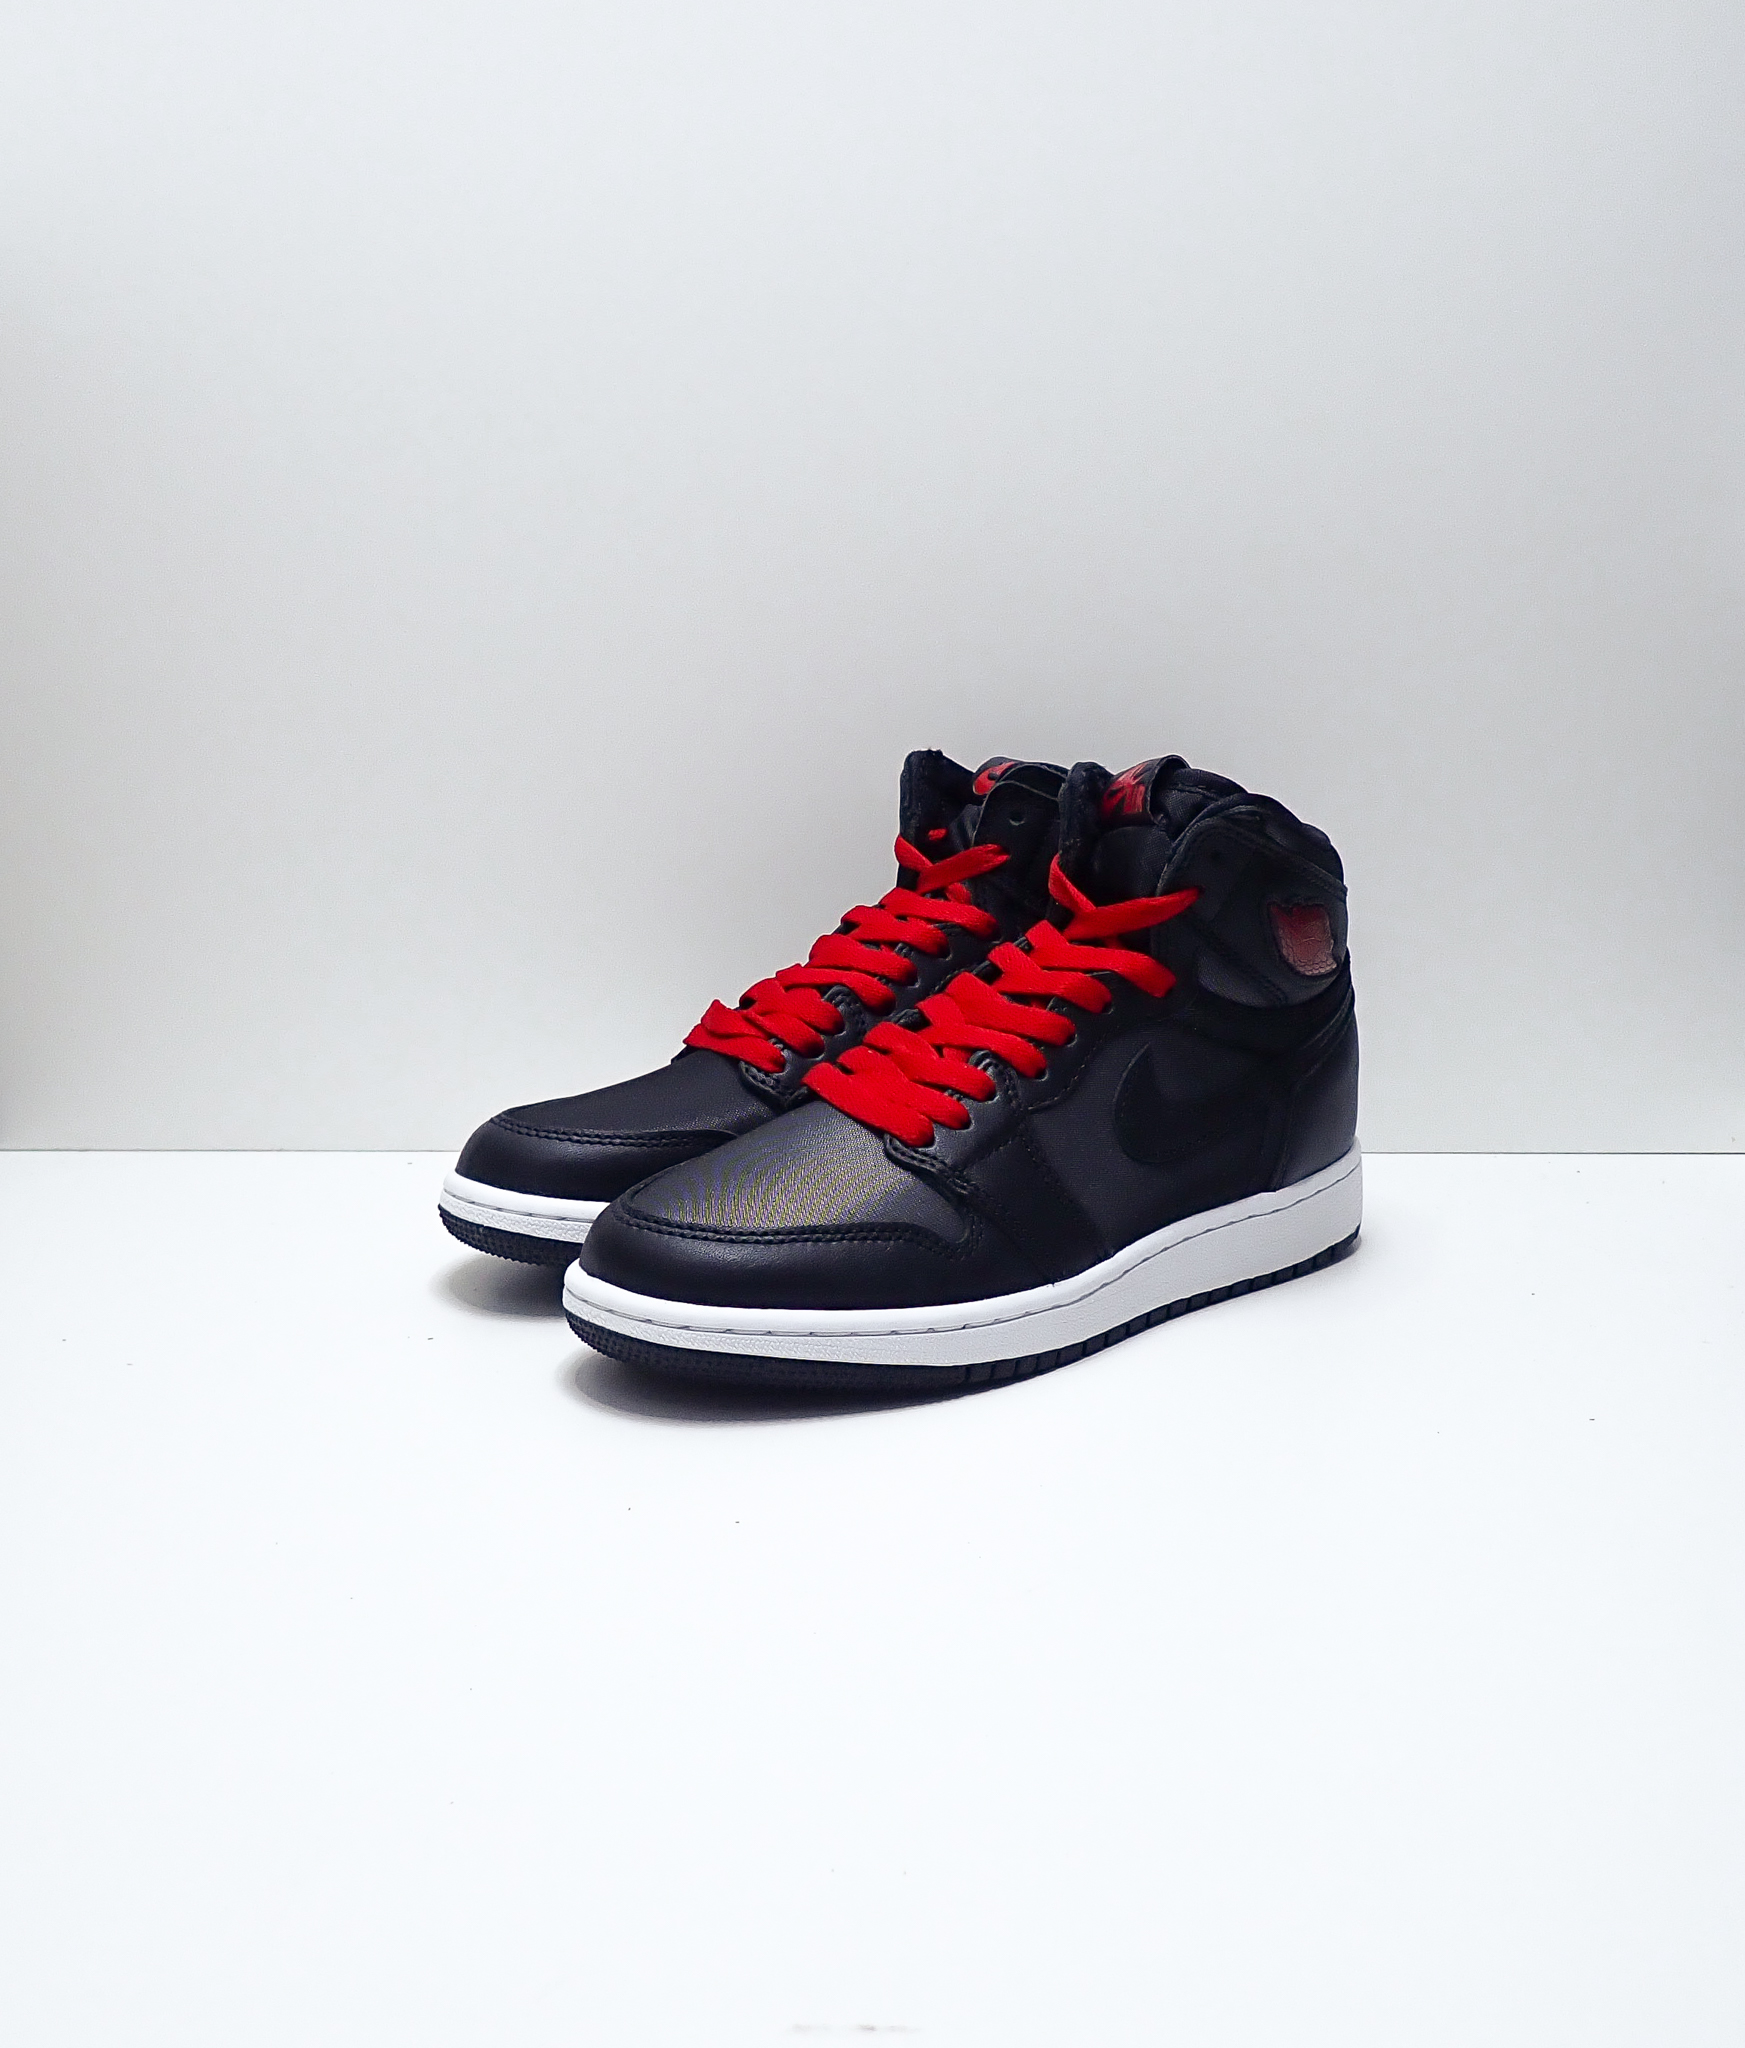 Jordan 1 Retro High Black Gym Red Black (GS)